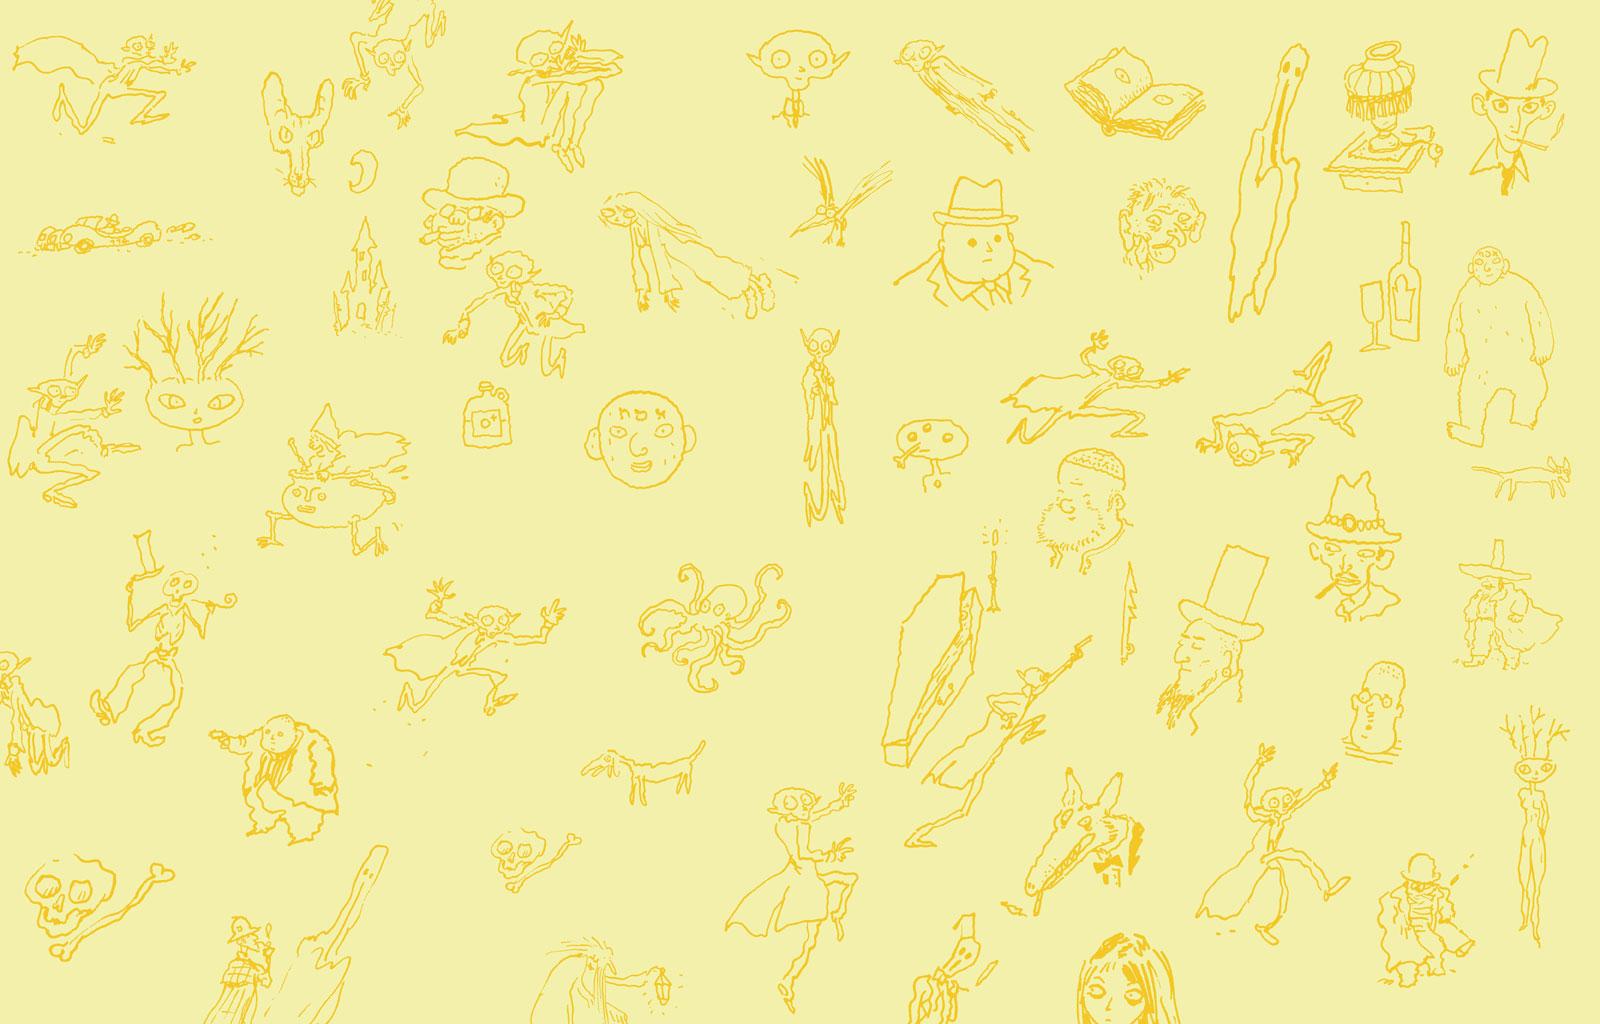 Smiley Full Hd Wallpaper And Achtergrond: Gele Achtergronden